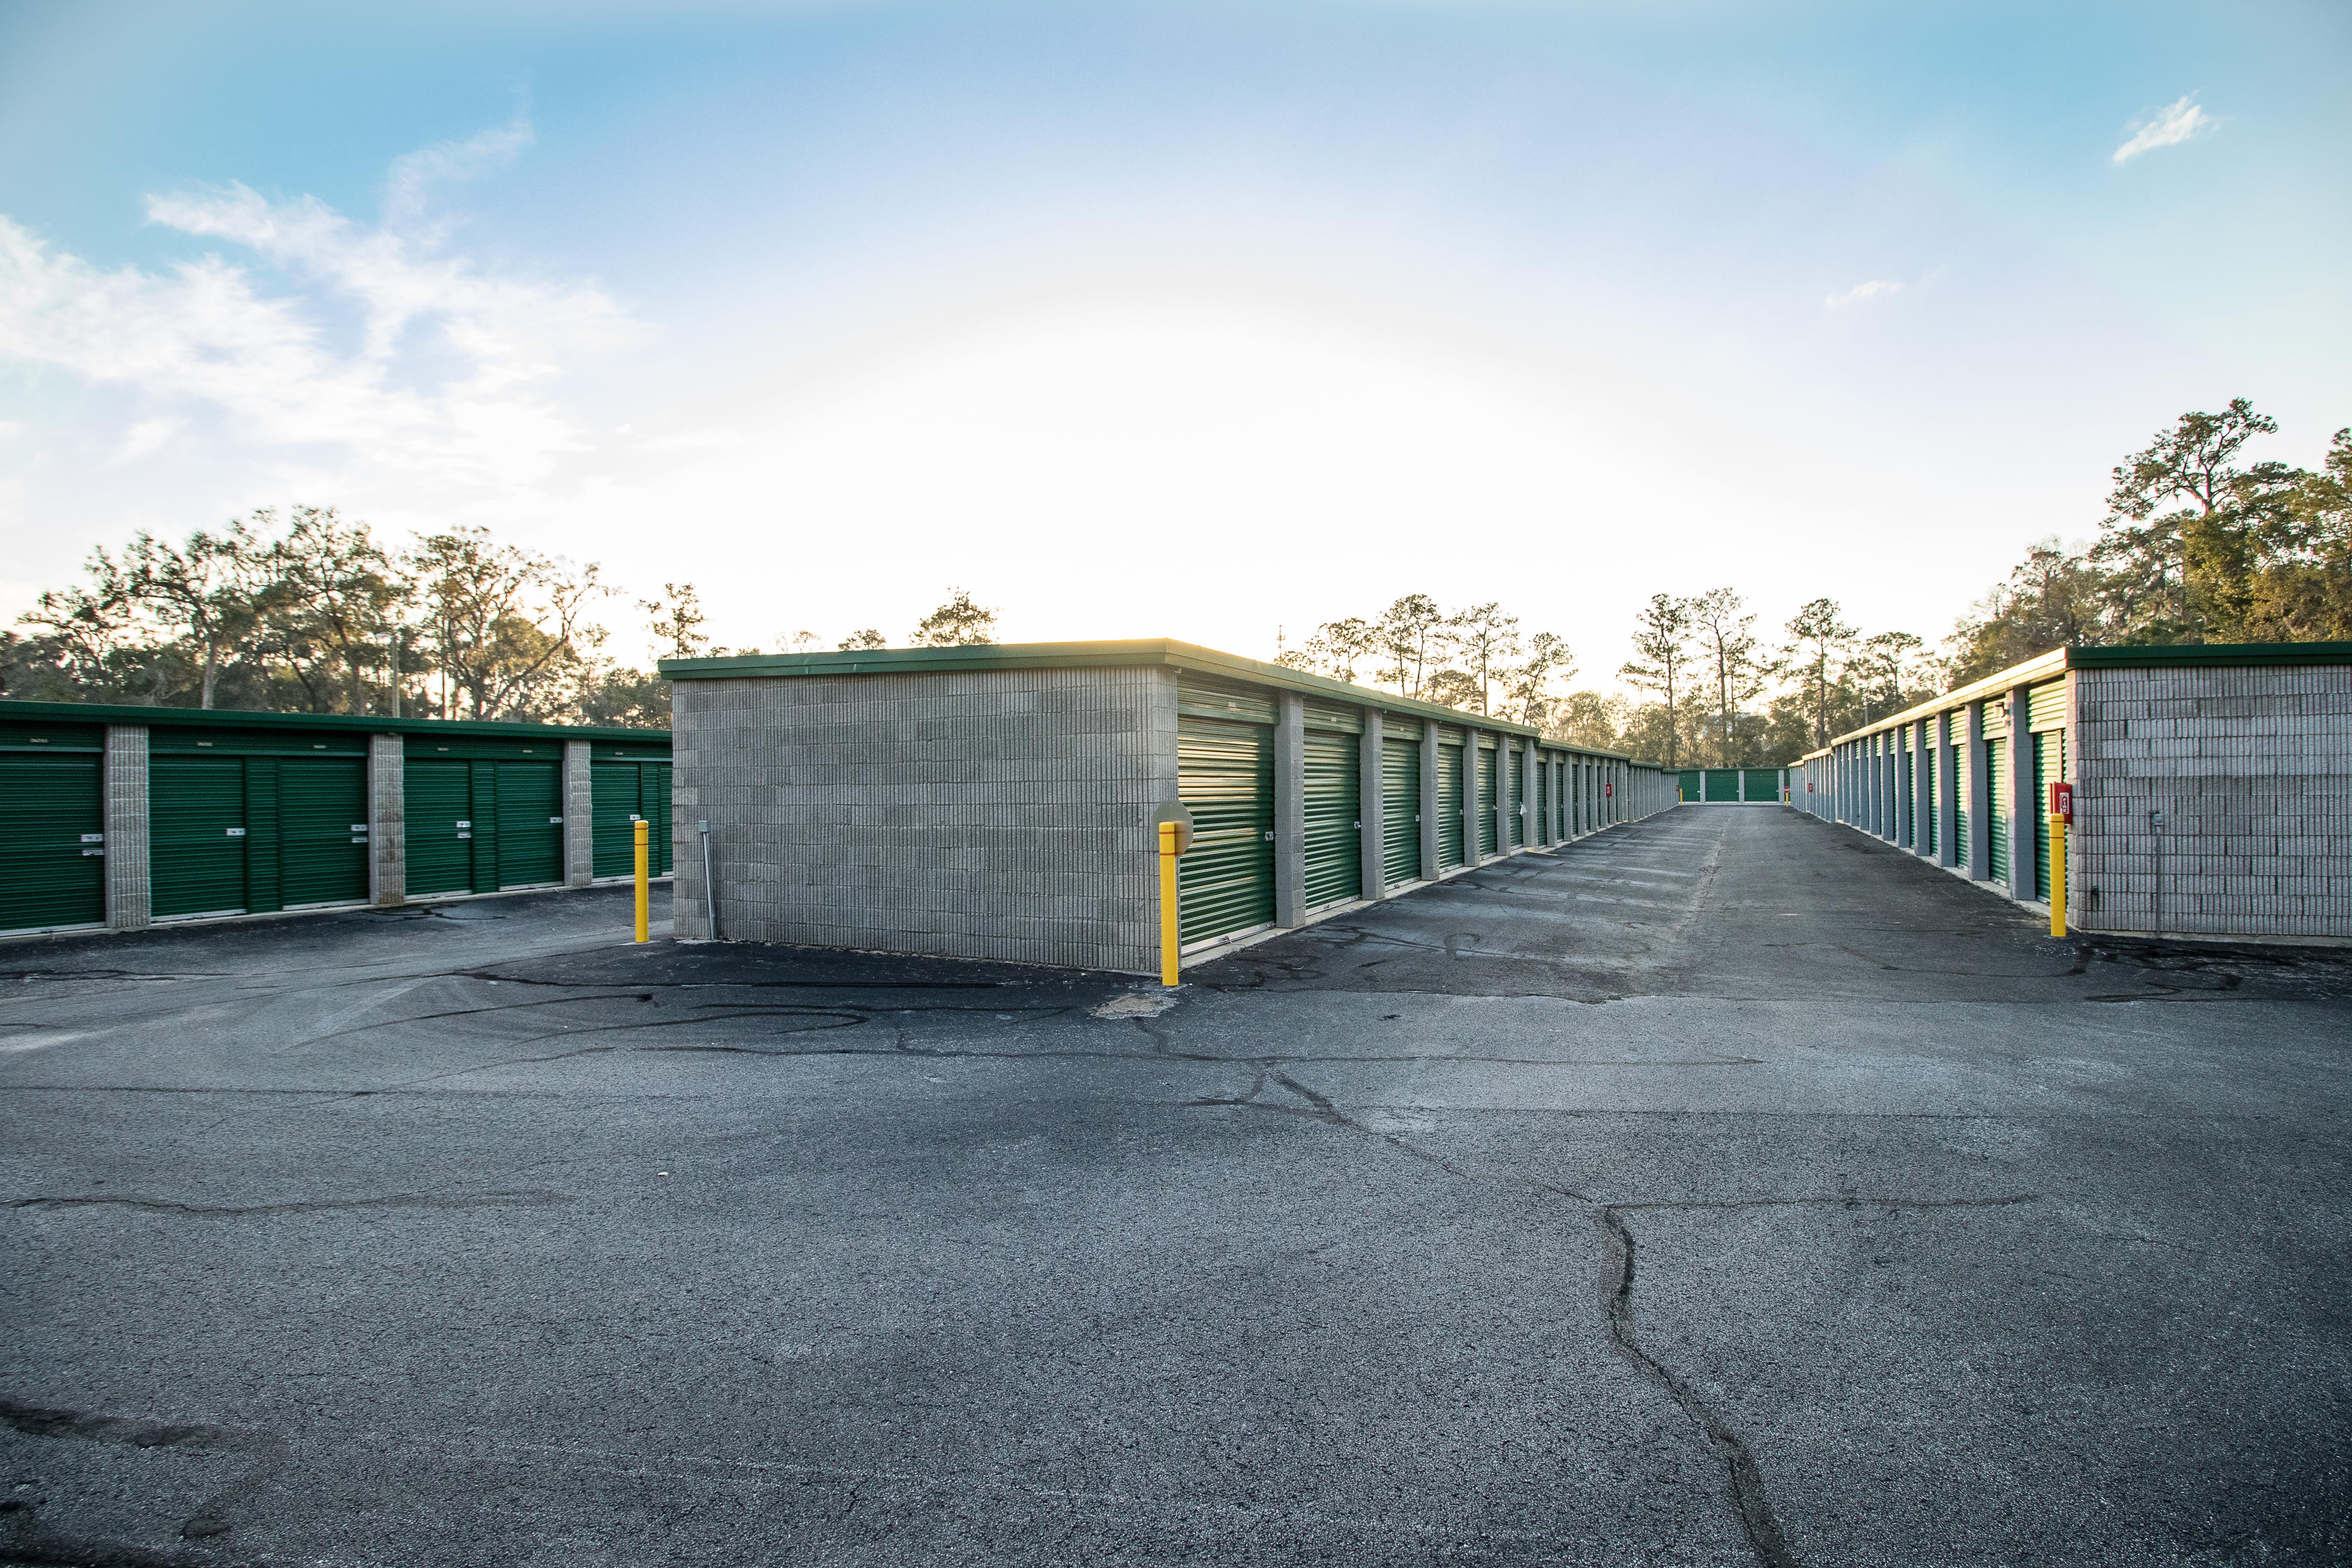 Self storage with clean exterior storage units at Neighborhood Storage